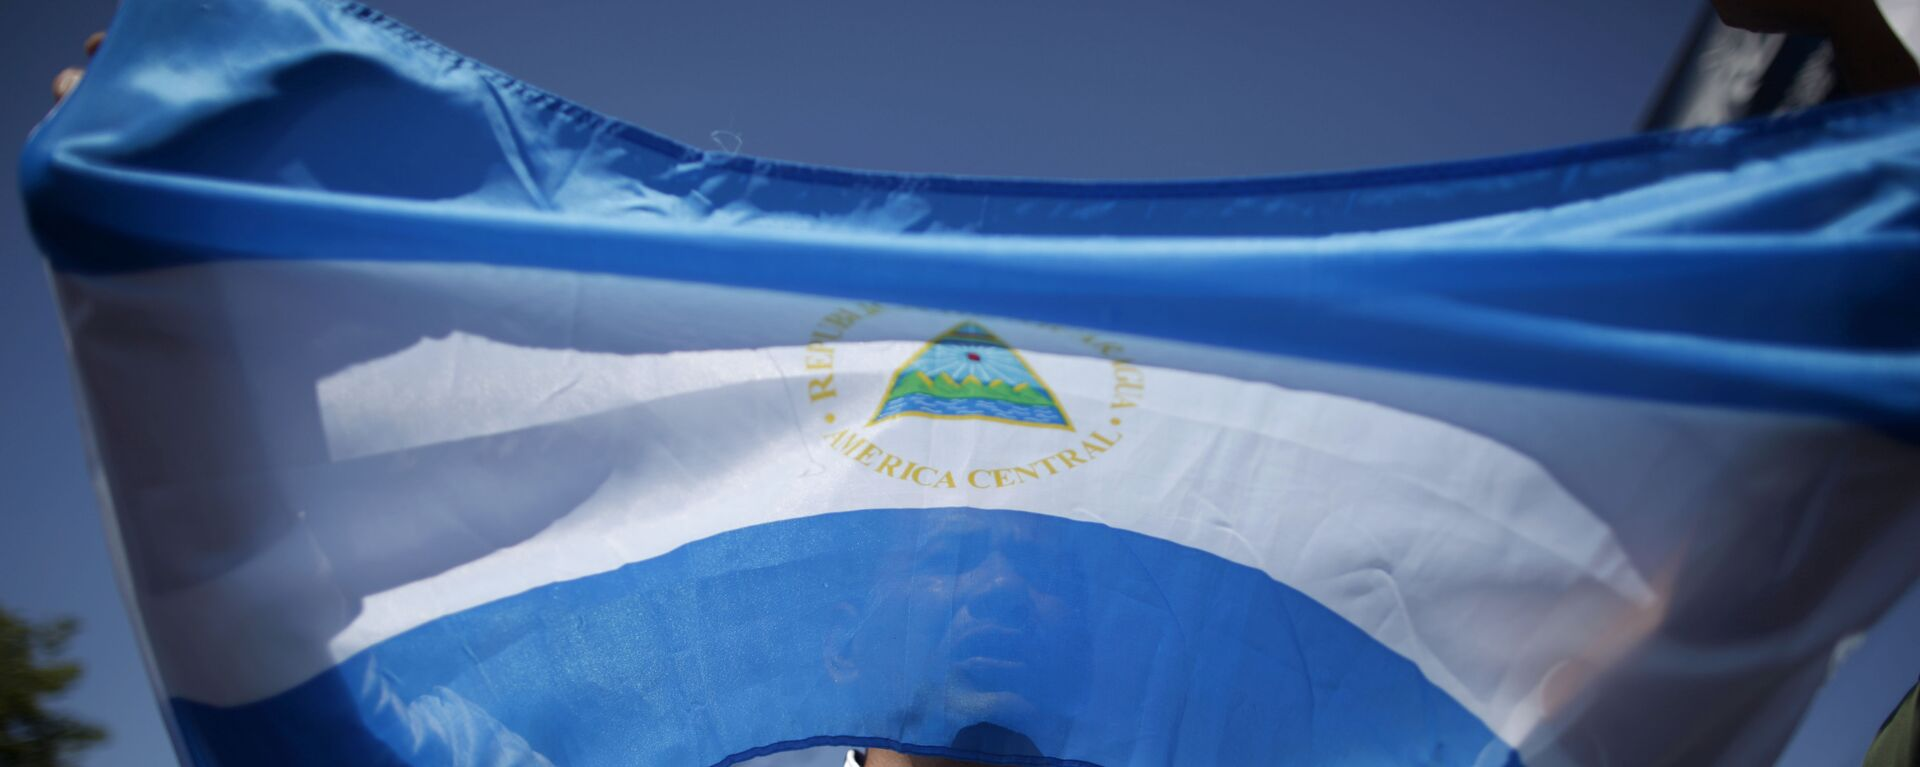 A man holds up a Nicaraguan flag during a demonstration against the presidential candidacy of Nicaragua's President Daniel Ortega in Managua, Nicaragua, Sunday, Feb 20, 2011.  - Sputnik Mundo, 1920, 02.08.2021